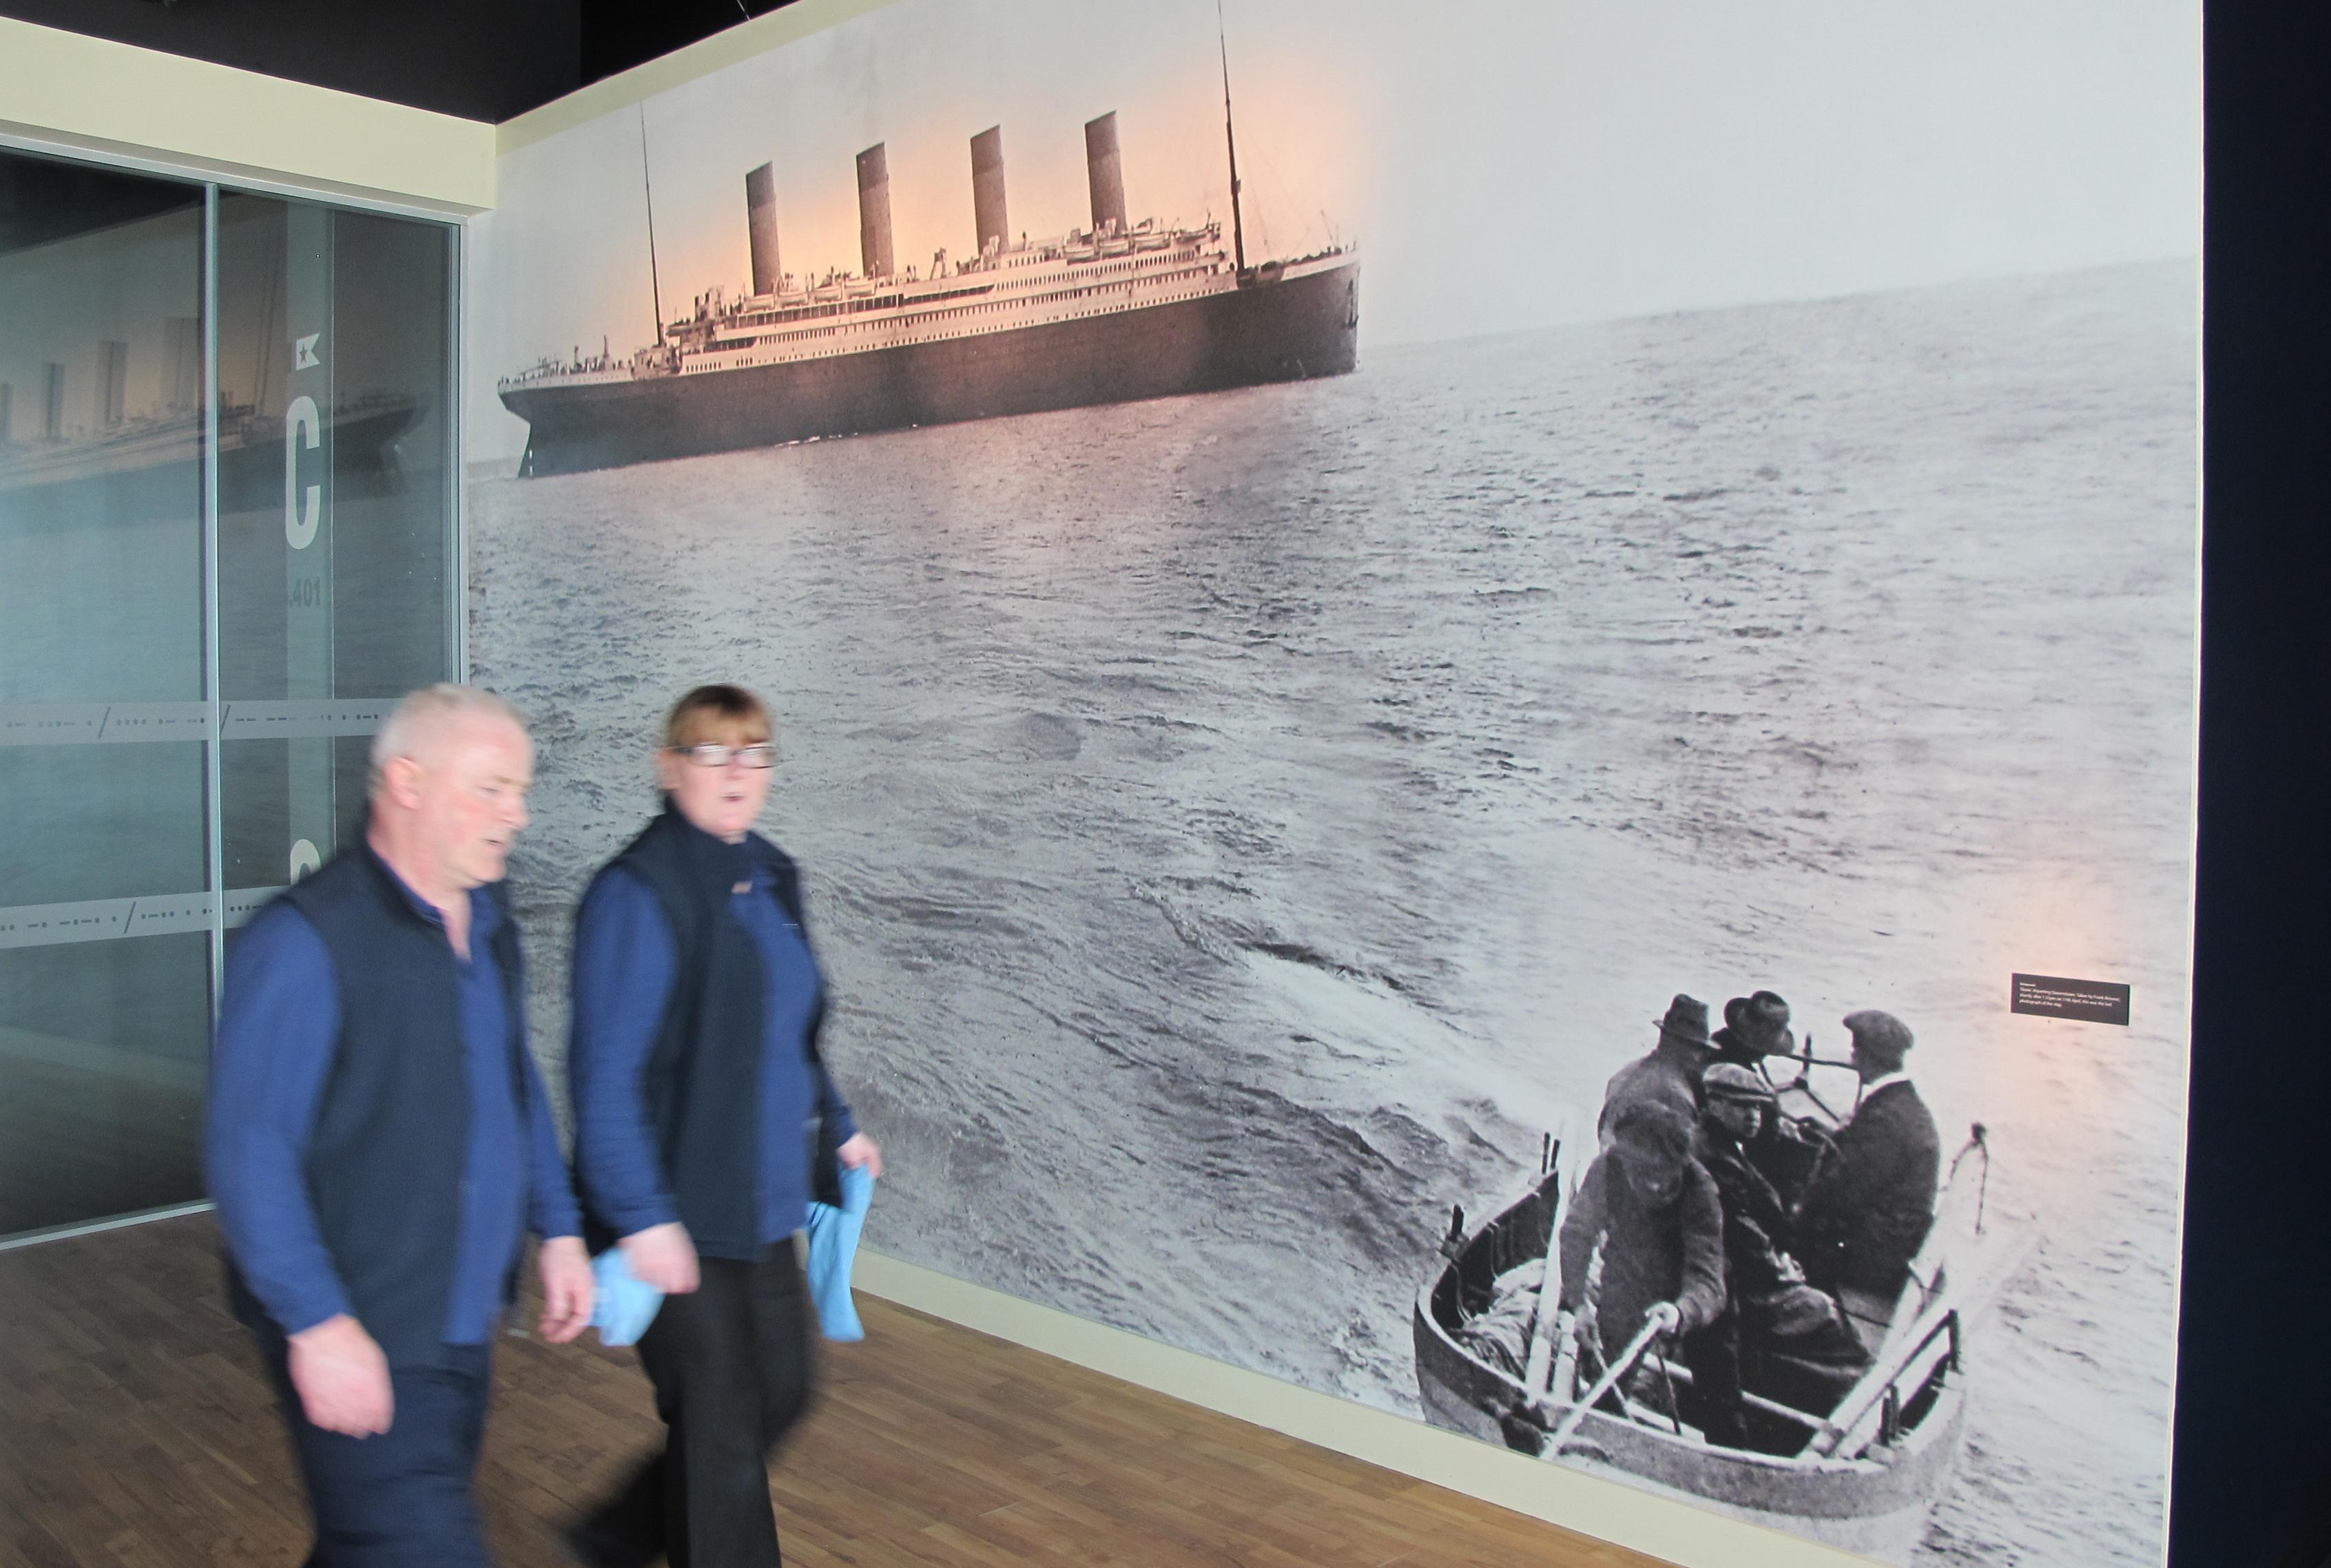 Belfast造船廠展示著鐵達尼號4月11日離開愛爾蘭Queenstown港,也是船難前最後身影。(美聯社)